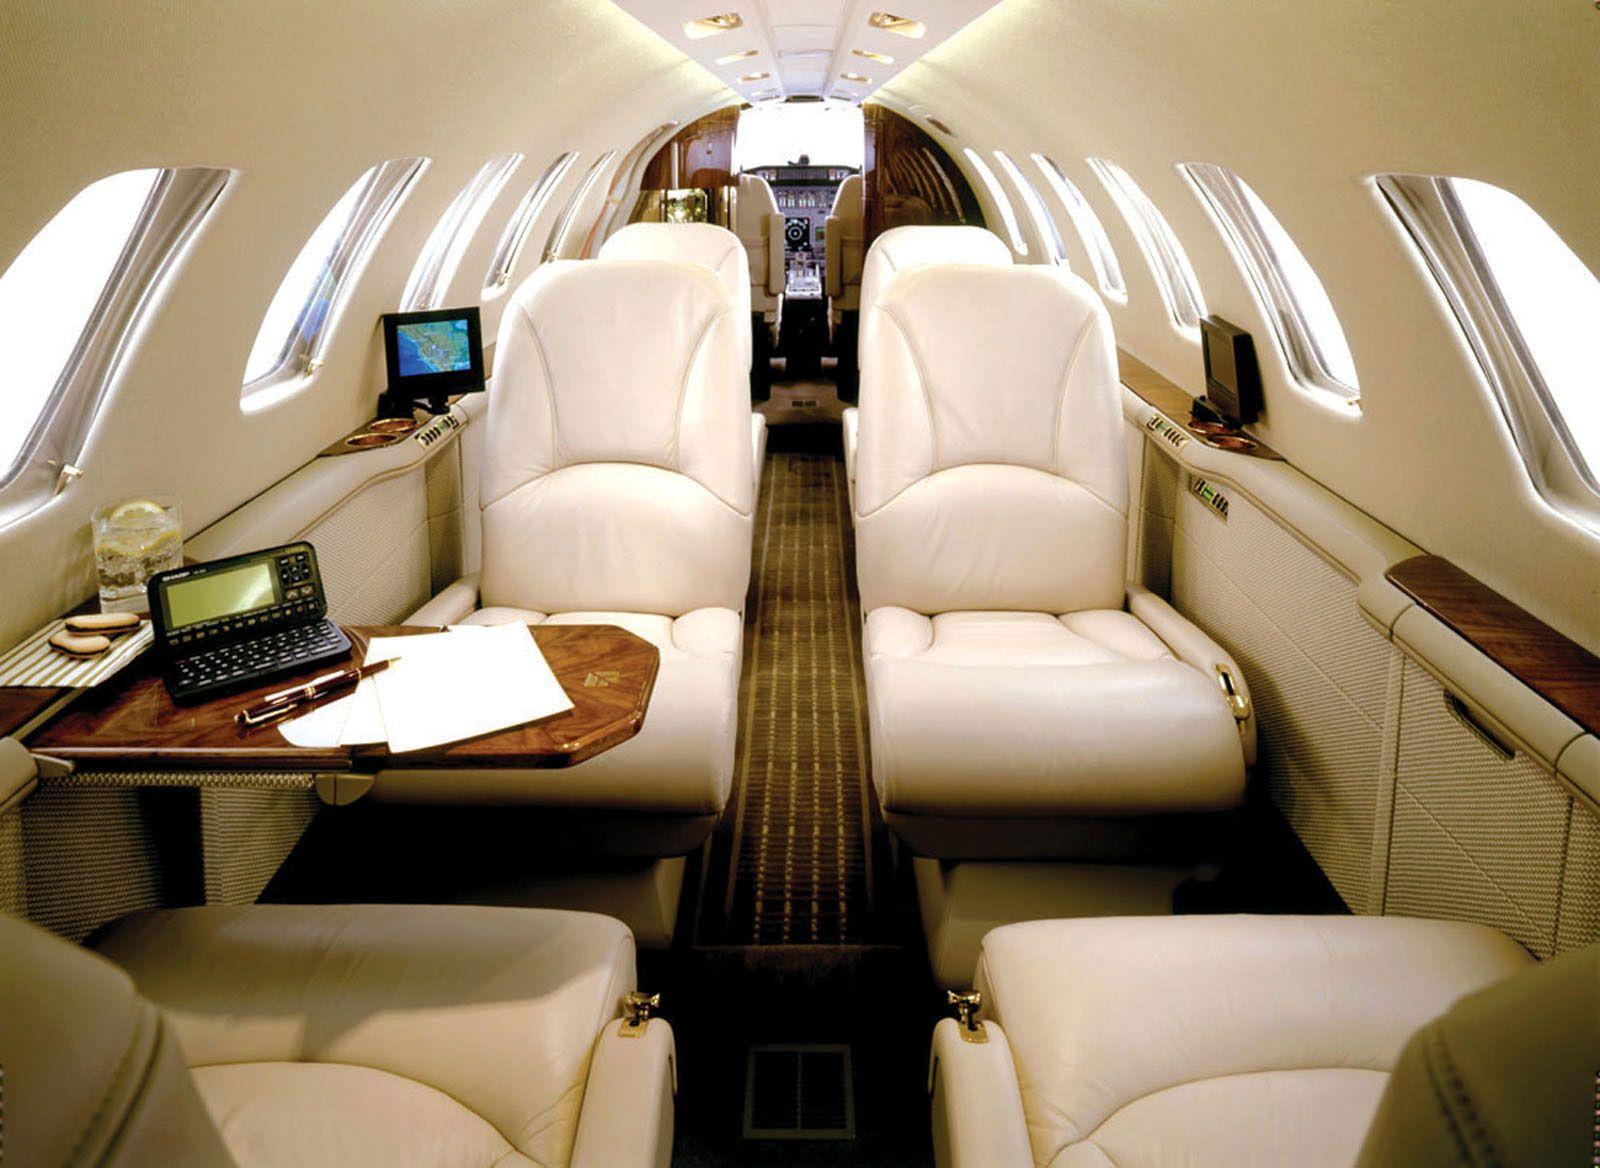 British airways' private jet service Private jet interior